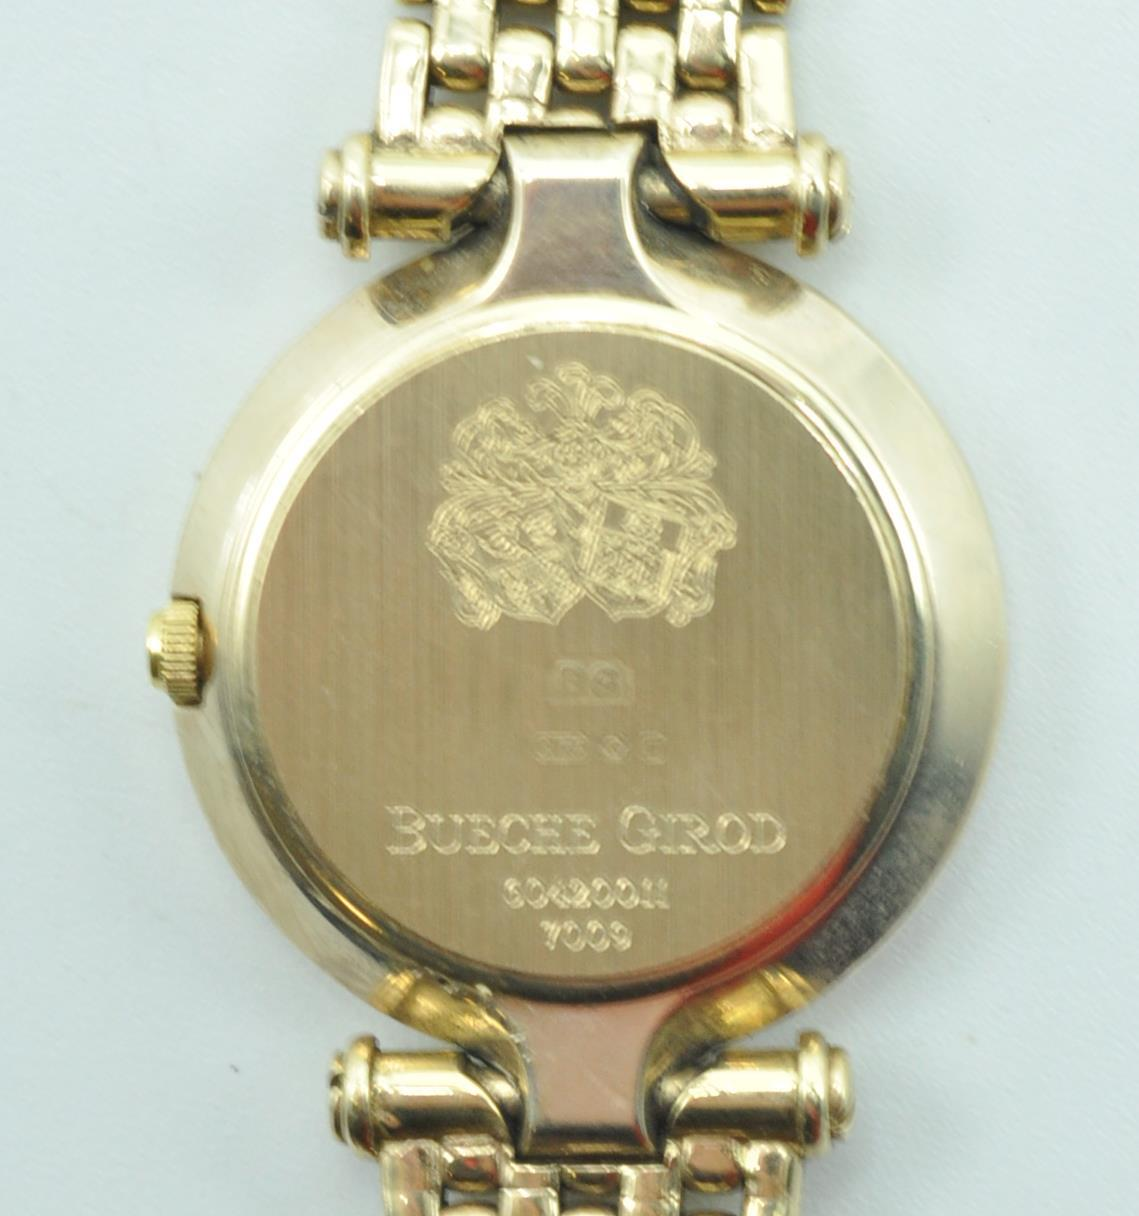 BUECHE GIROD 9CT GOLD AND DIAMOND WRIST WATCH - Image 8 of 8